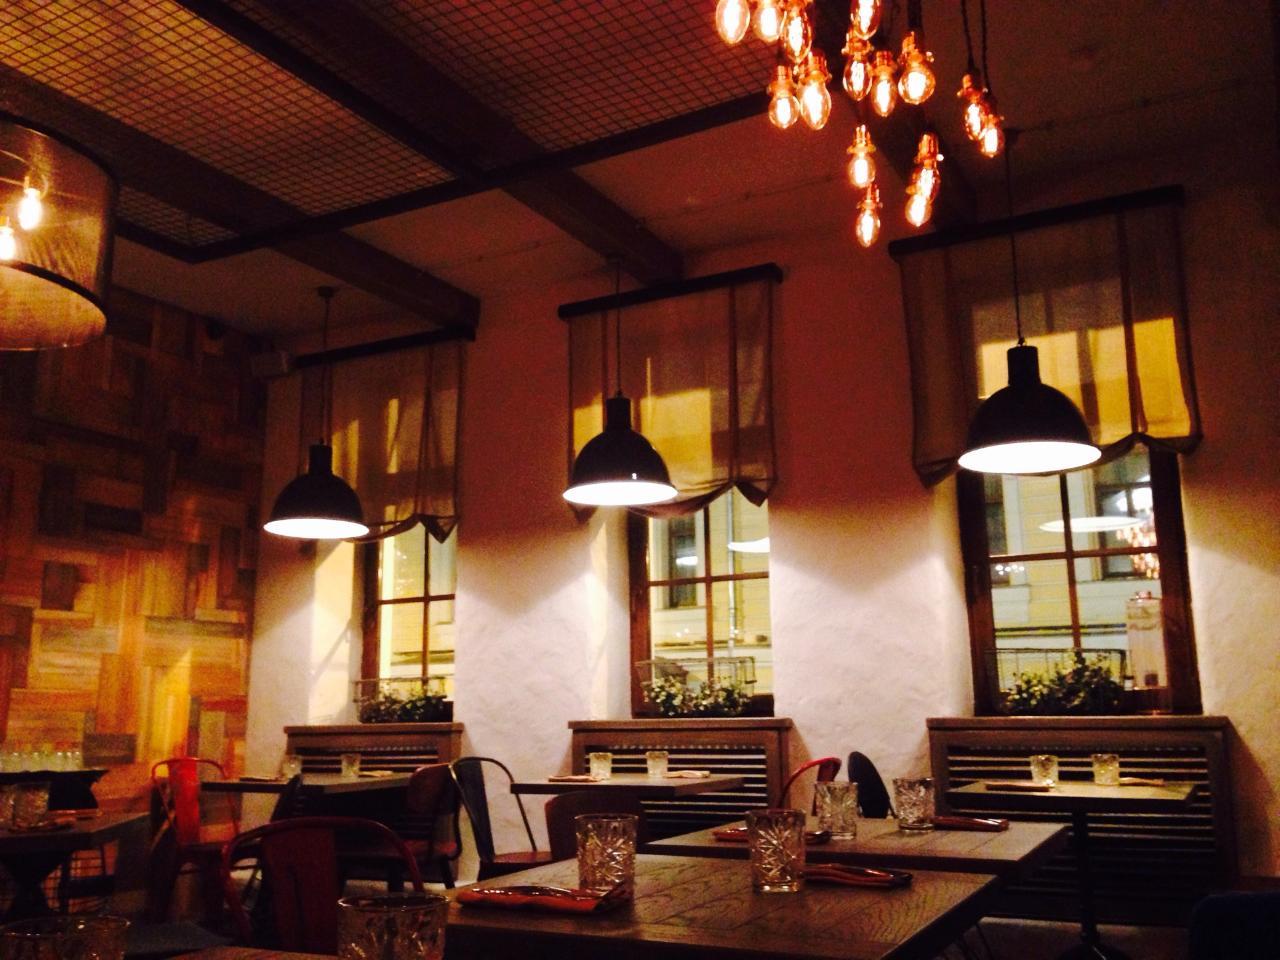 Ресторан Утки и вафли фото 4